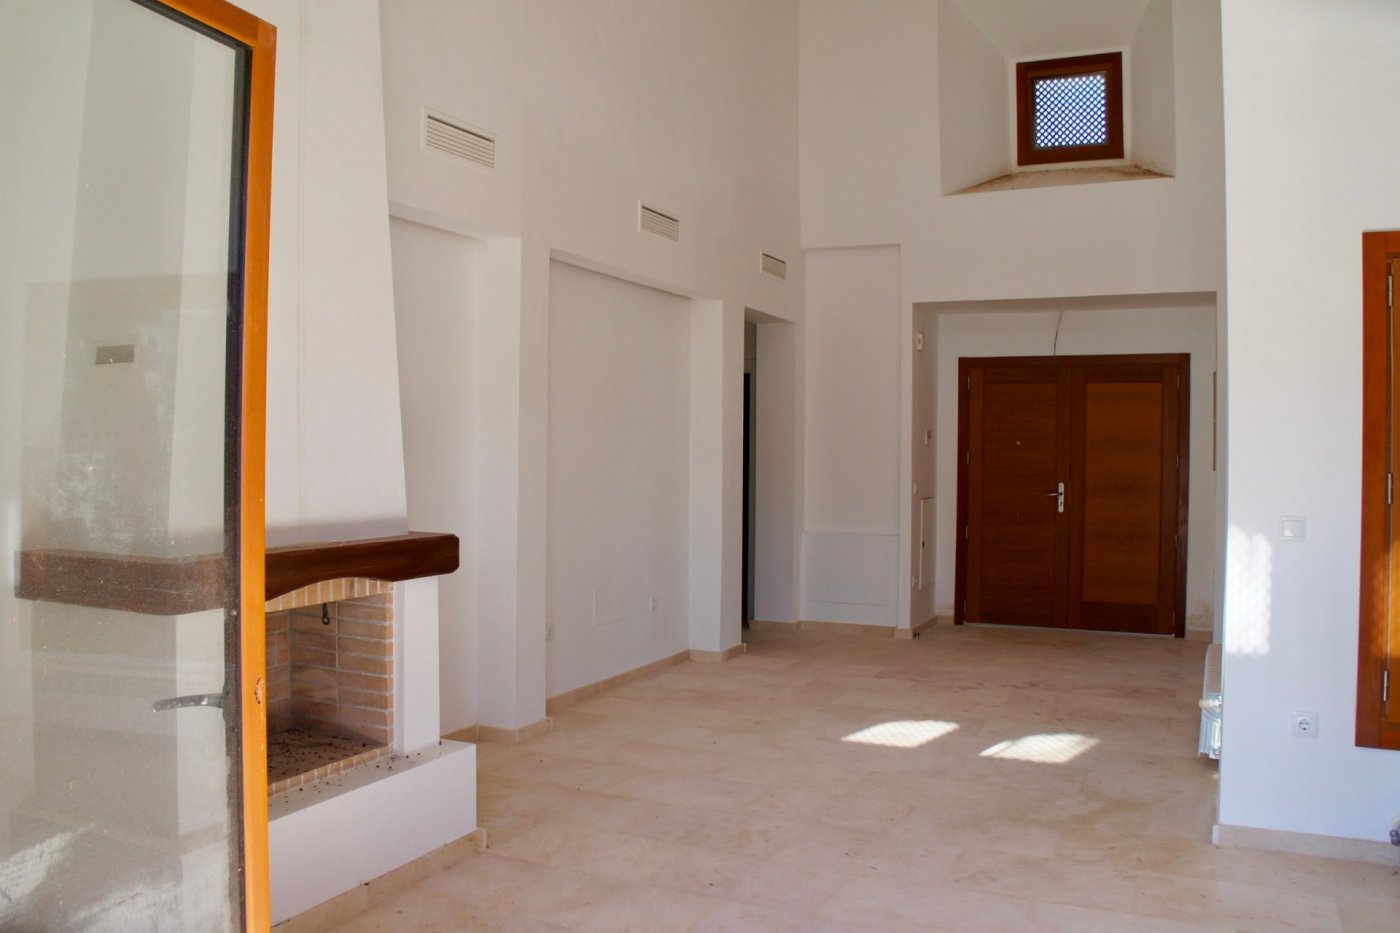 Gallery Image 6 of Fantastic offer - bank repossessed south facing villa on EL Valle Golf Resort